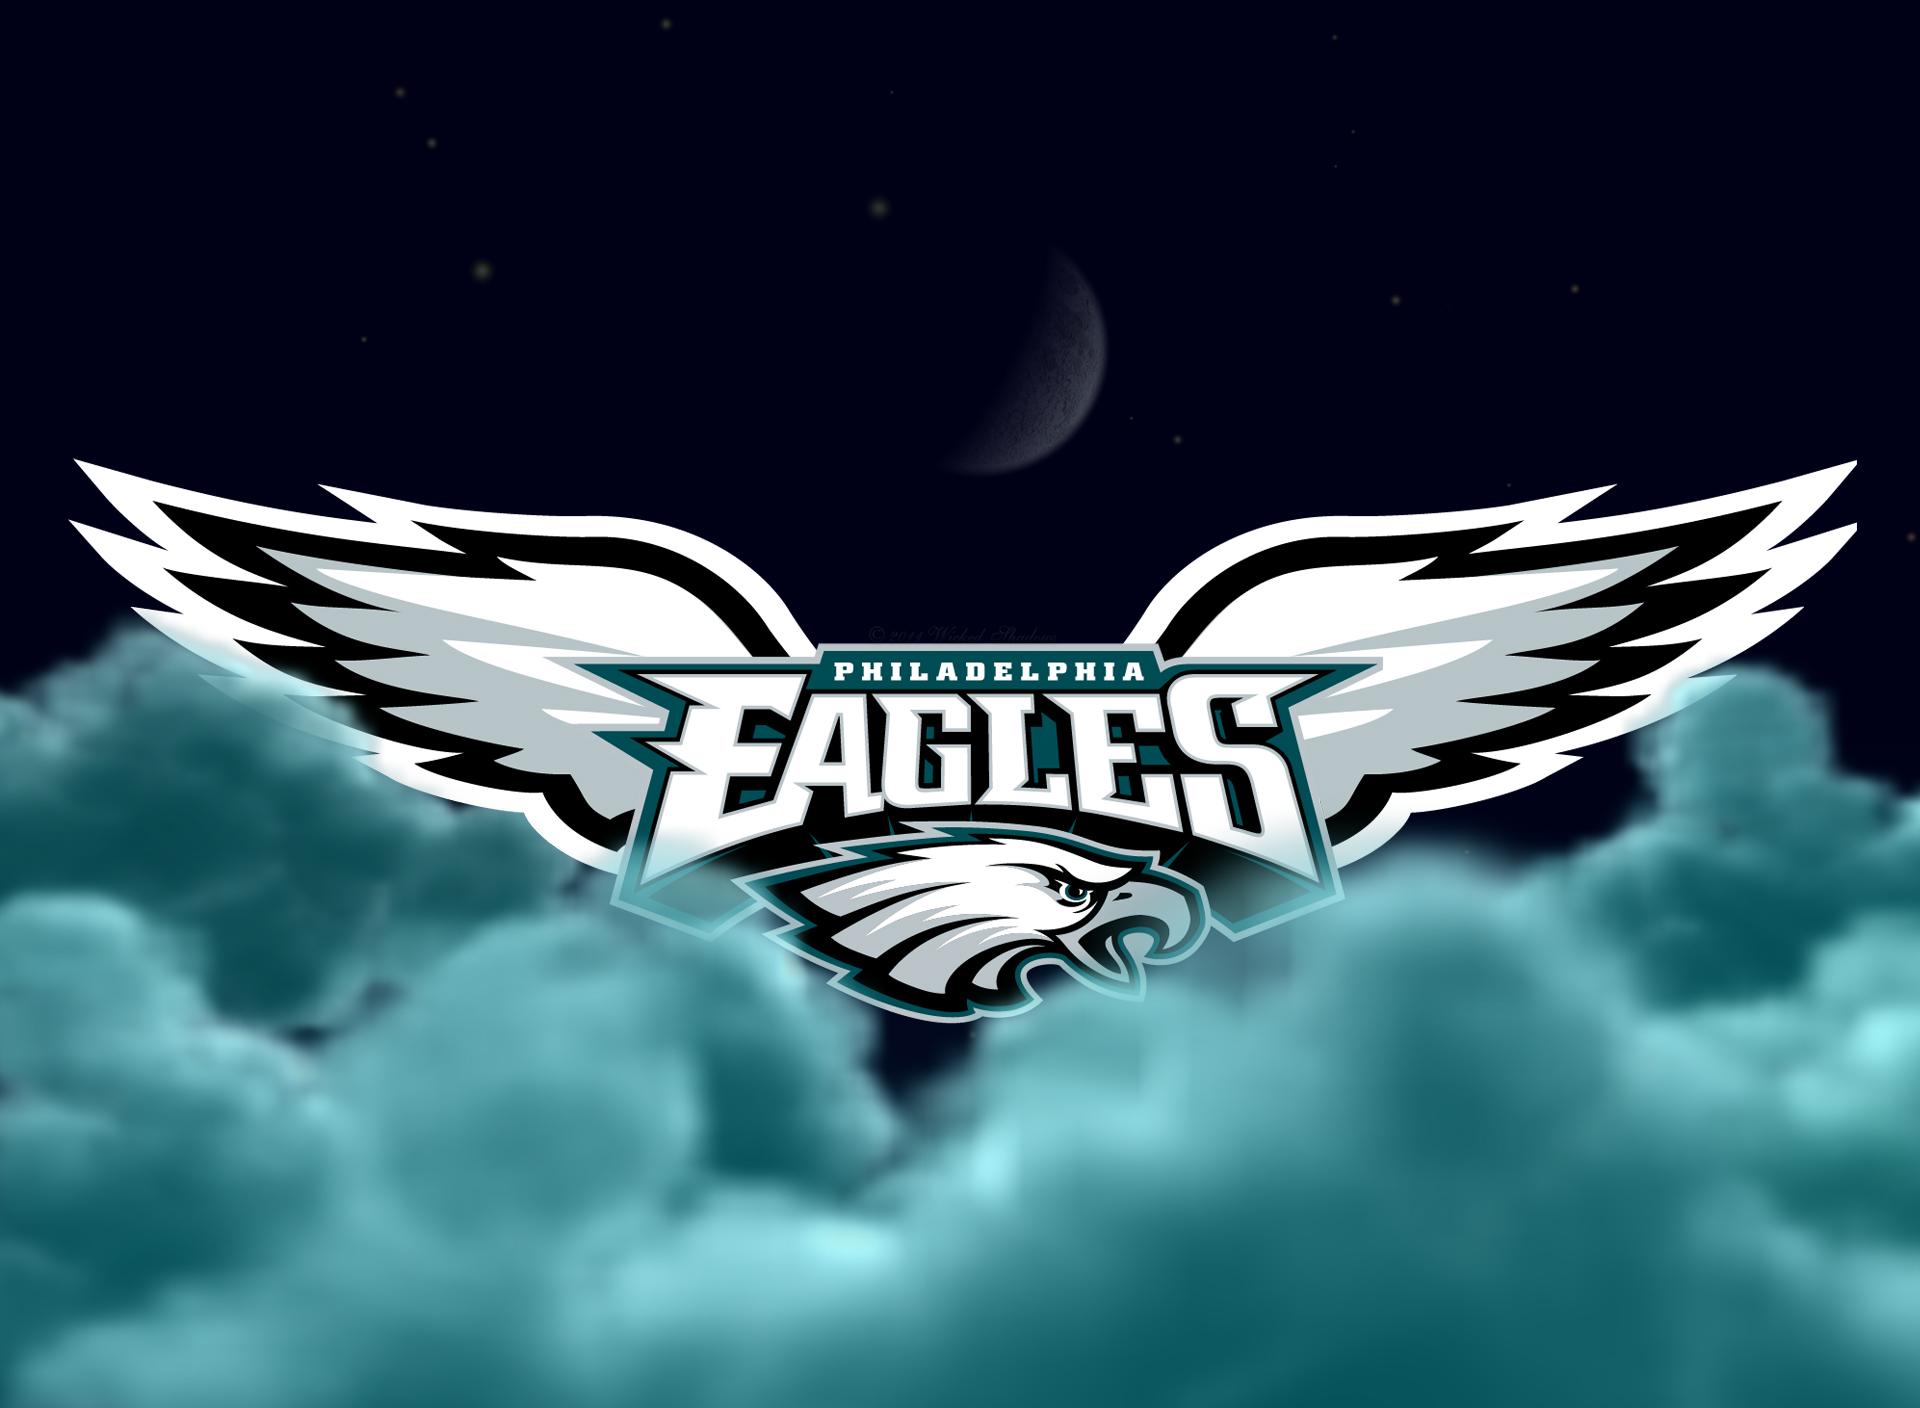 Philadelphia eagles 1920x1408 wallpaper1920X1408 wallpaper screensaver 1920x1408